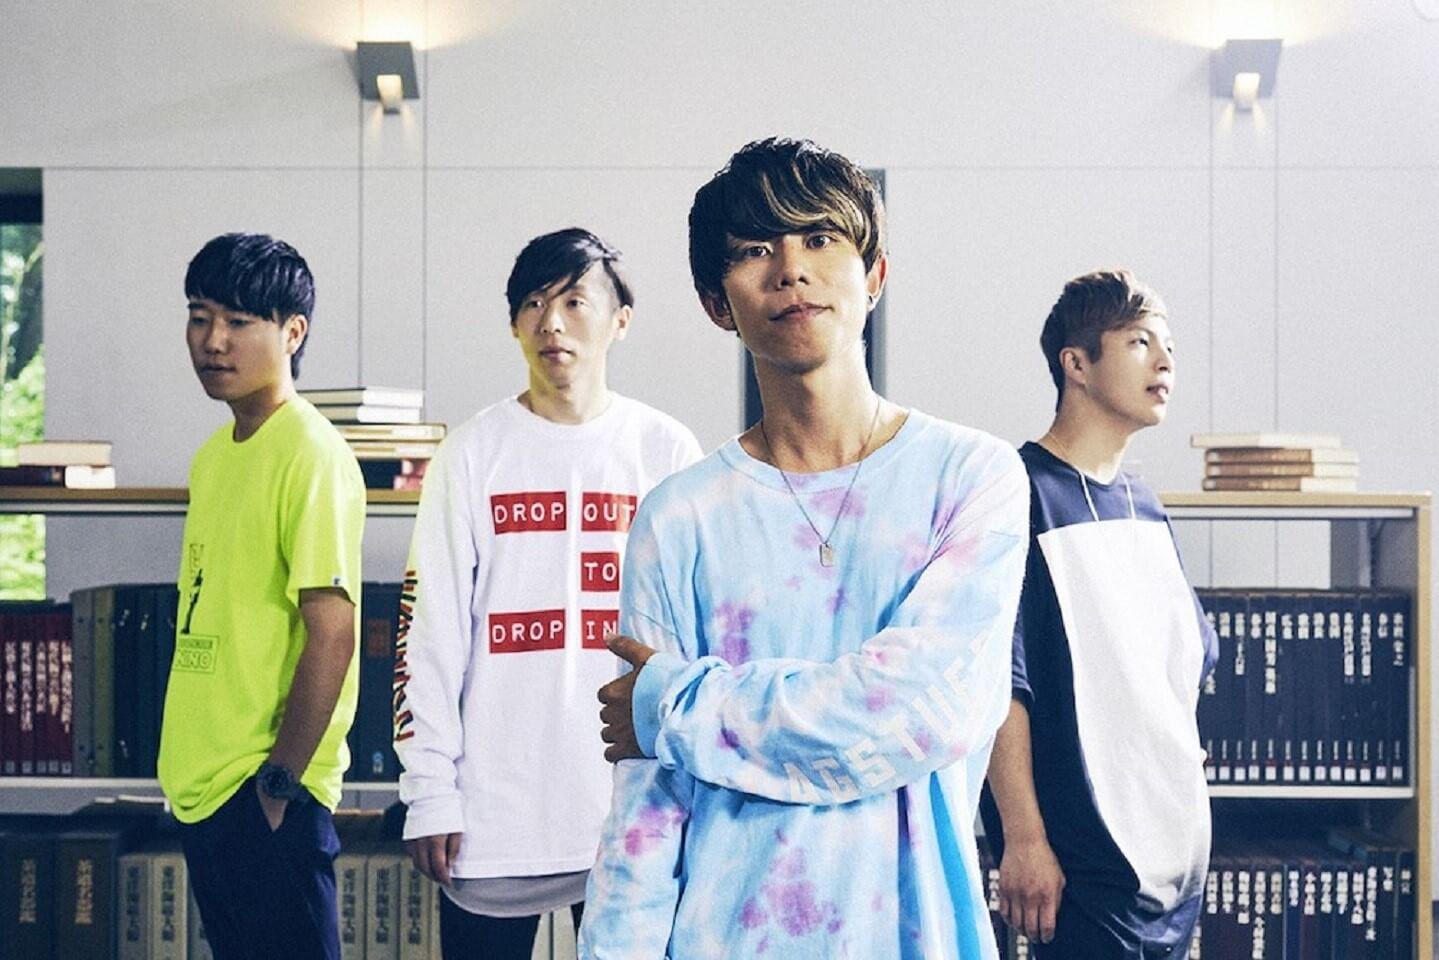 AIRFLIP、メジャーファーストフルアルバム『NEO-N』詳細を公開&アルバムレコ発ツアー決定サムネイル画像